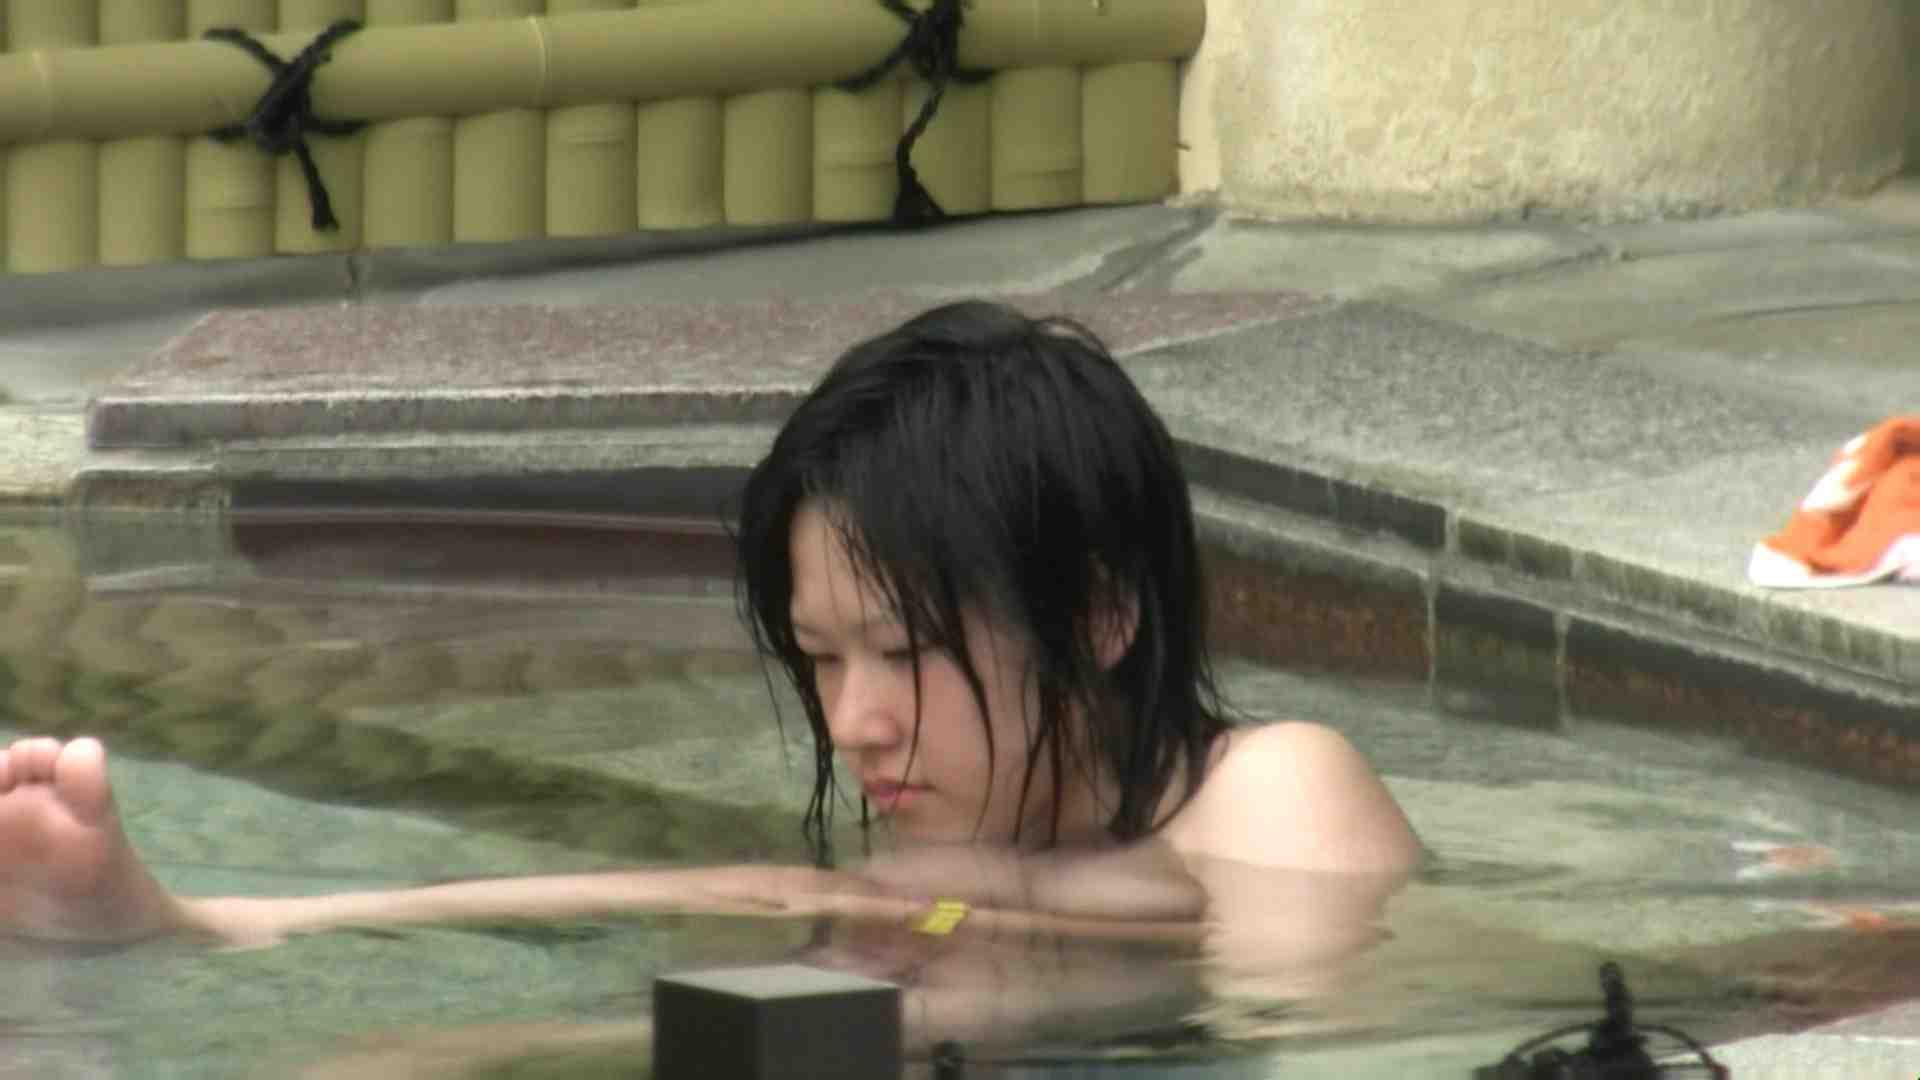 Aquaな露天風呂Vol.36 盗撮 | HなOL  68pic 21